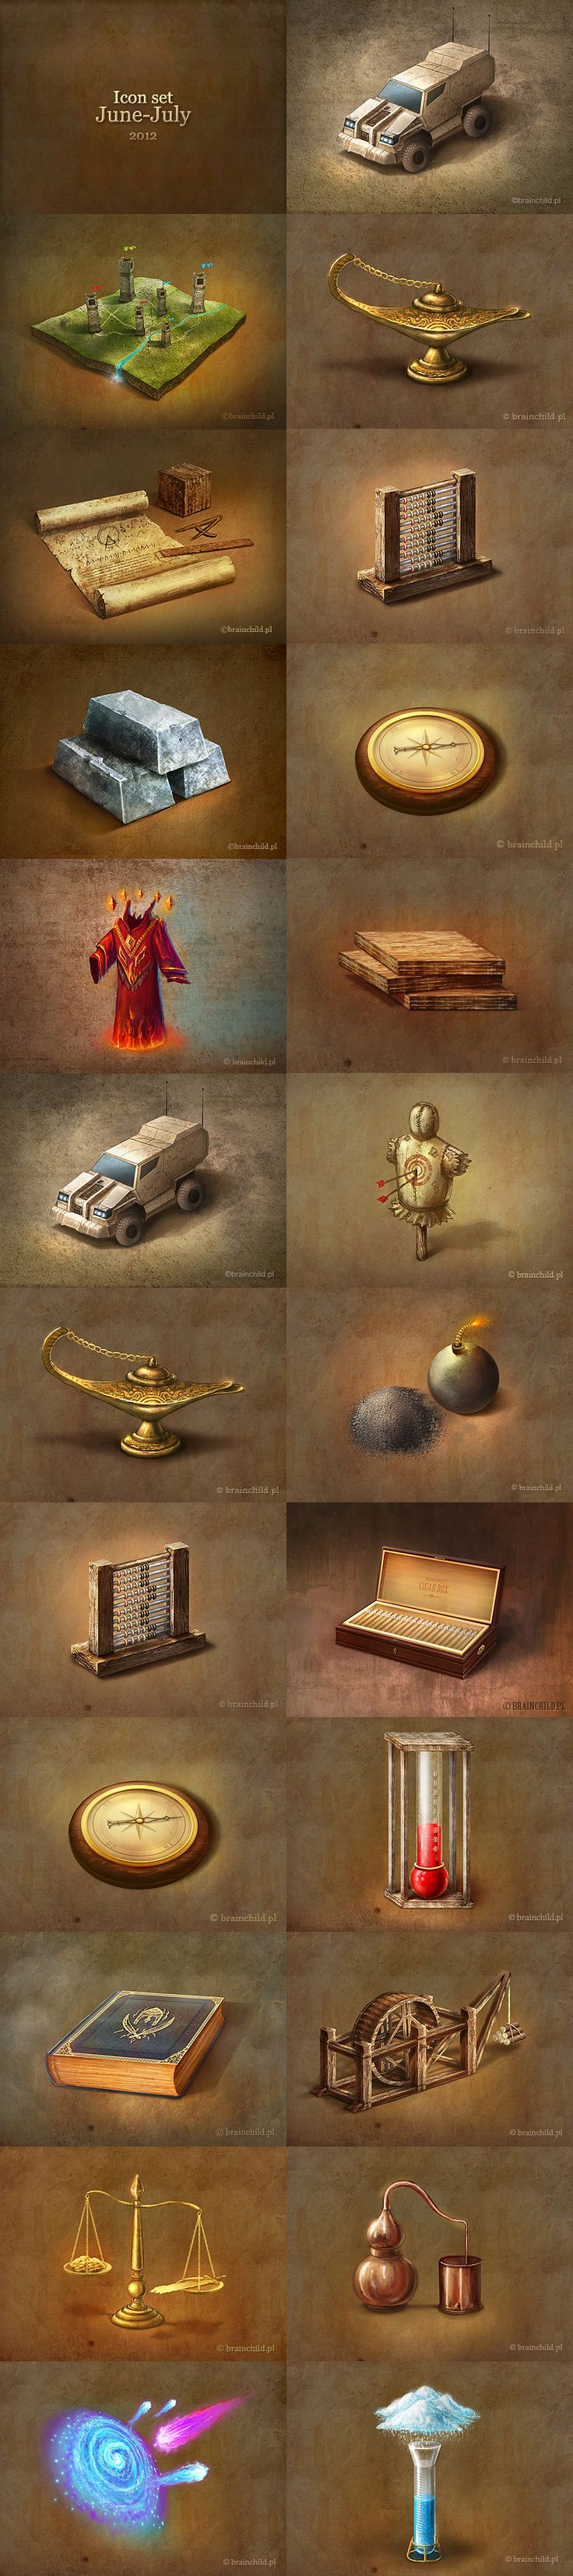 icons by brainchilds.deviantart.com